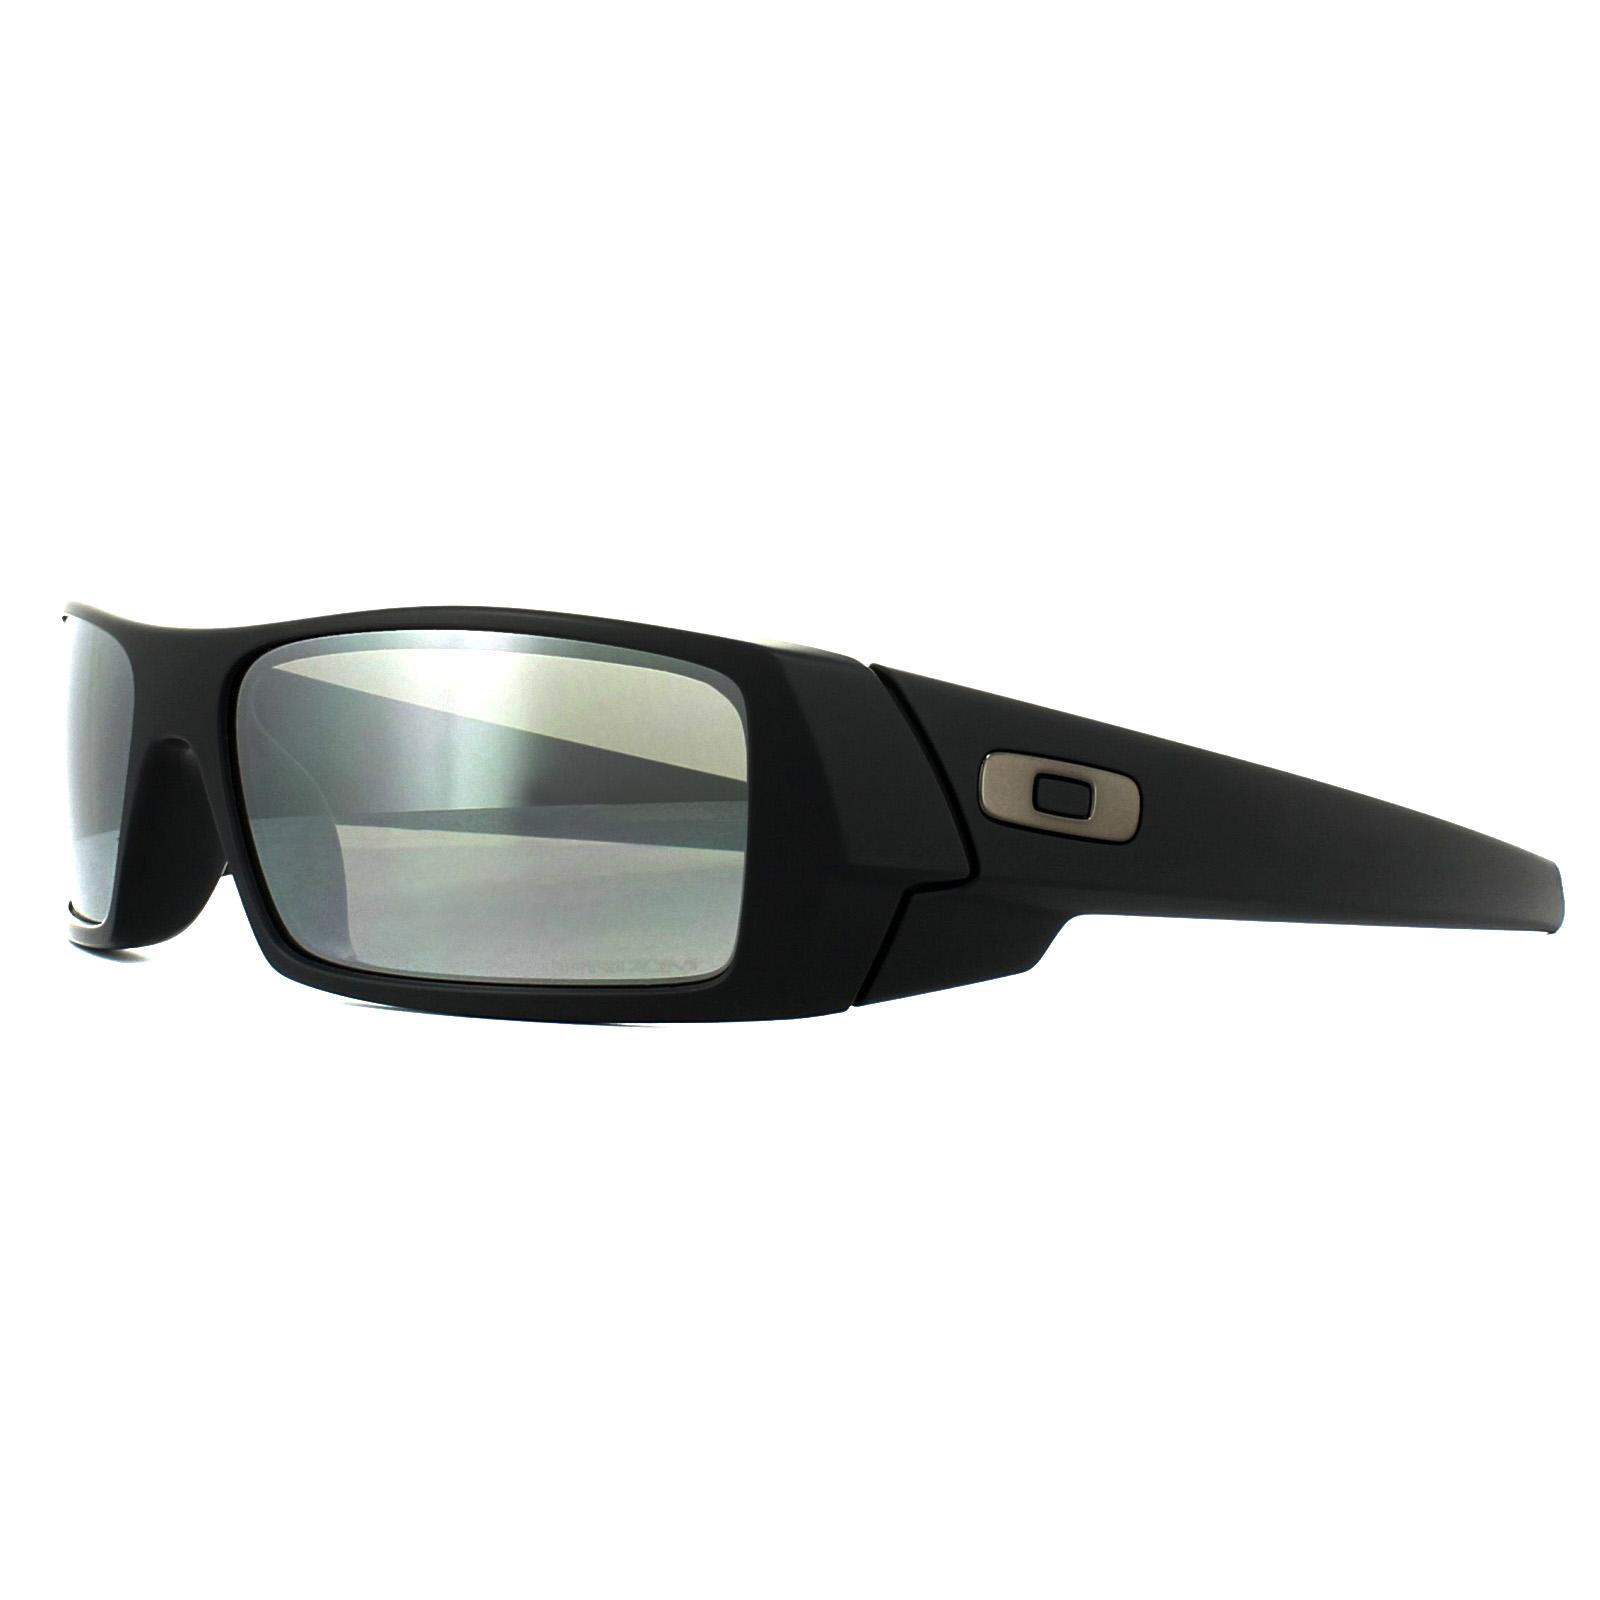 bd441a9c25 Sentinel Oakley Sunglasses Gascan OO9014-43 Matt Black Prizm Black.  Sentinel Thumbnail 2